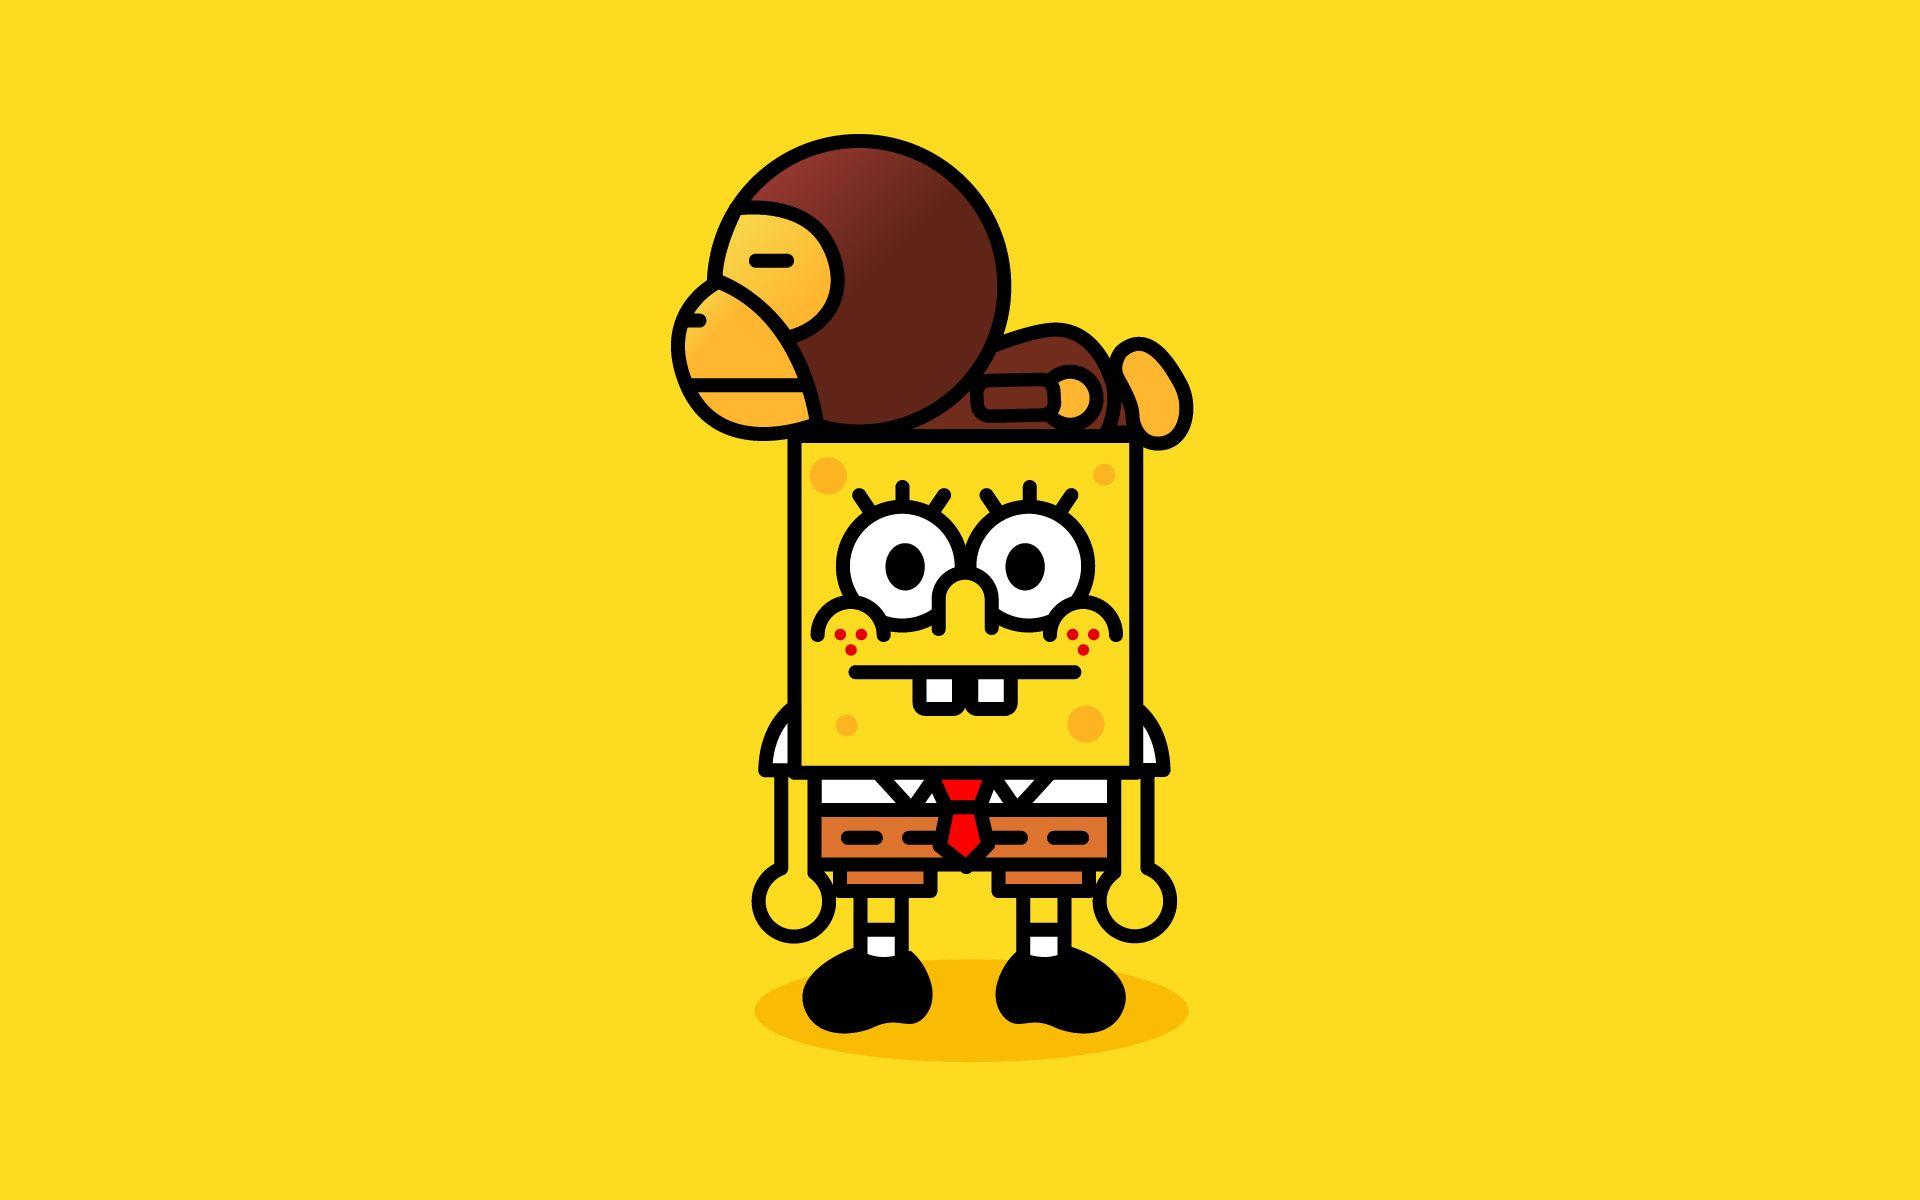 Monkey Spongebob Hehe Spongebob Wallpaper Bape Wallpapers Cartoon Wallpaper Hd